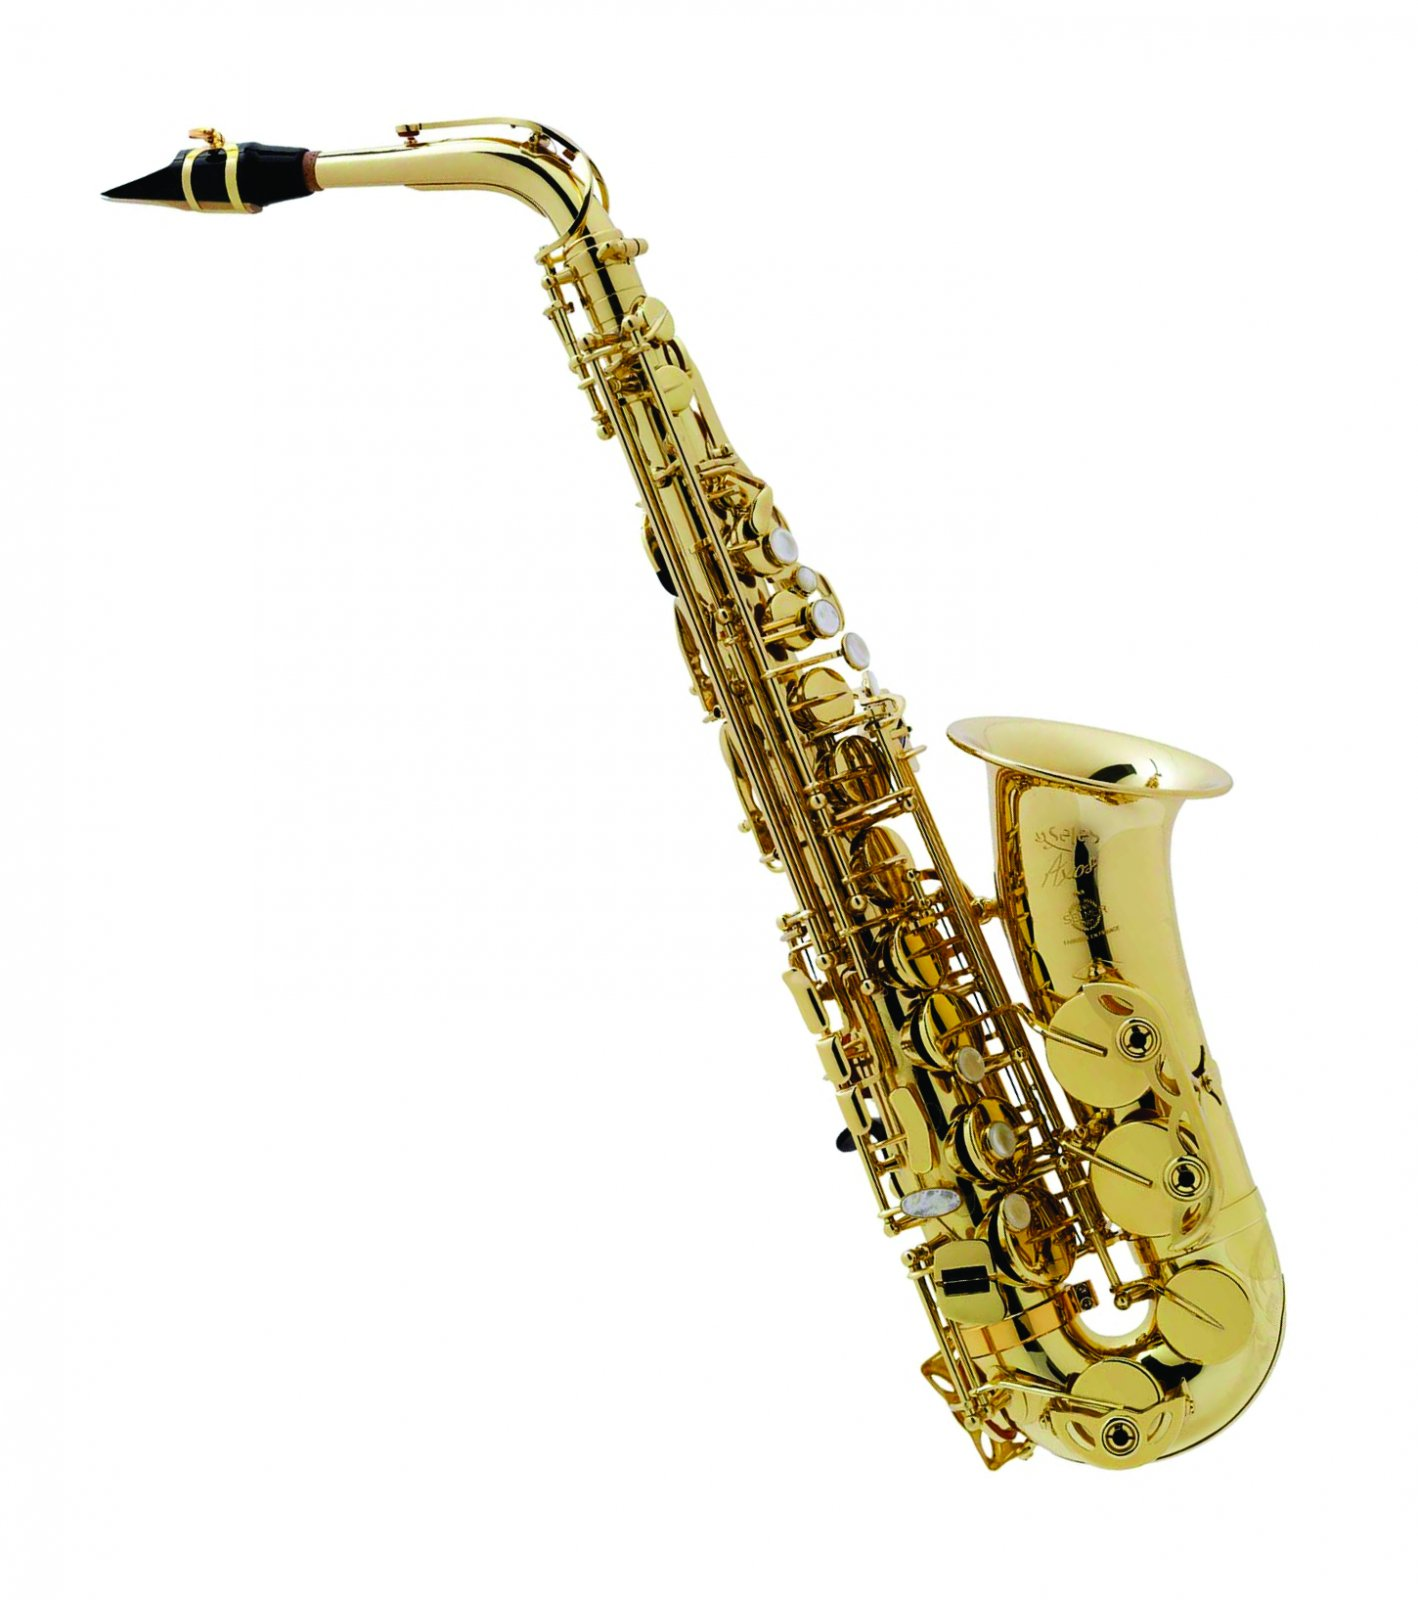 HENRI SELMER PARIS 52AXOS Professional Eb Alto Saxophone